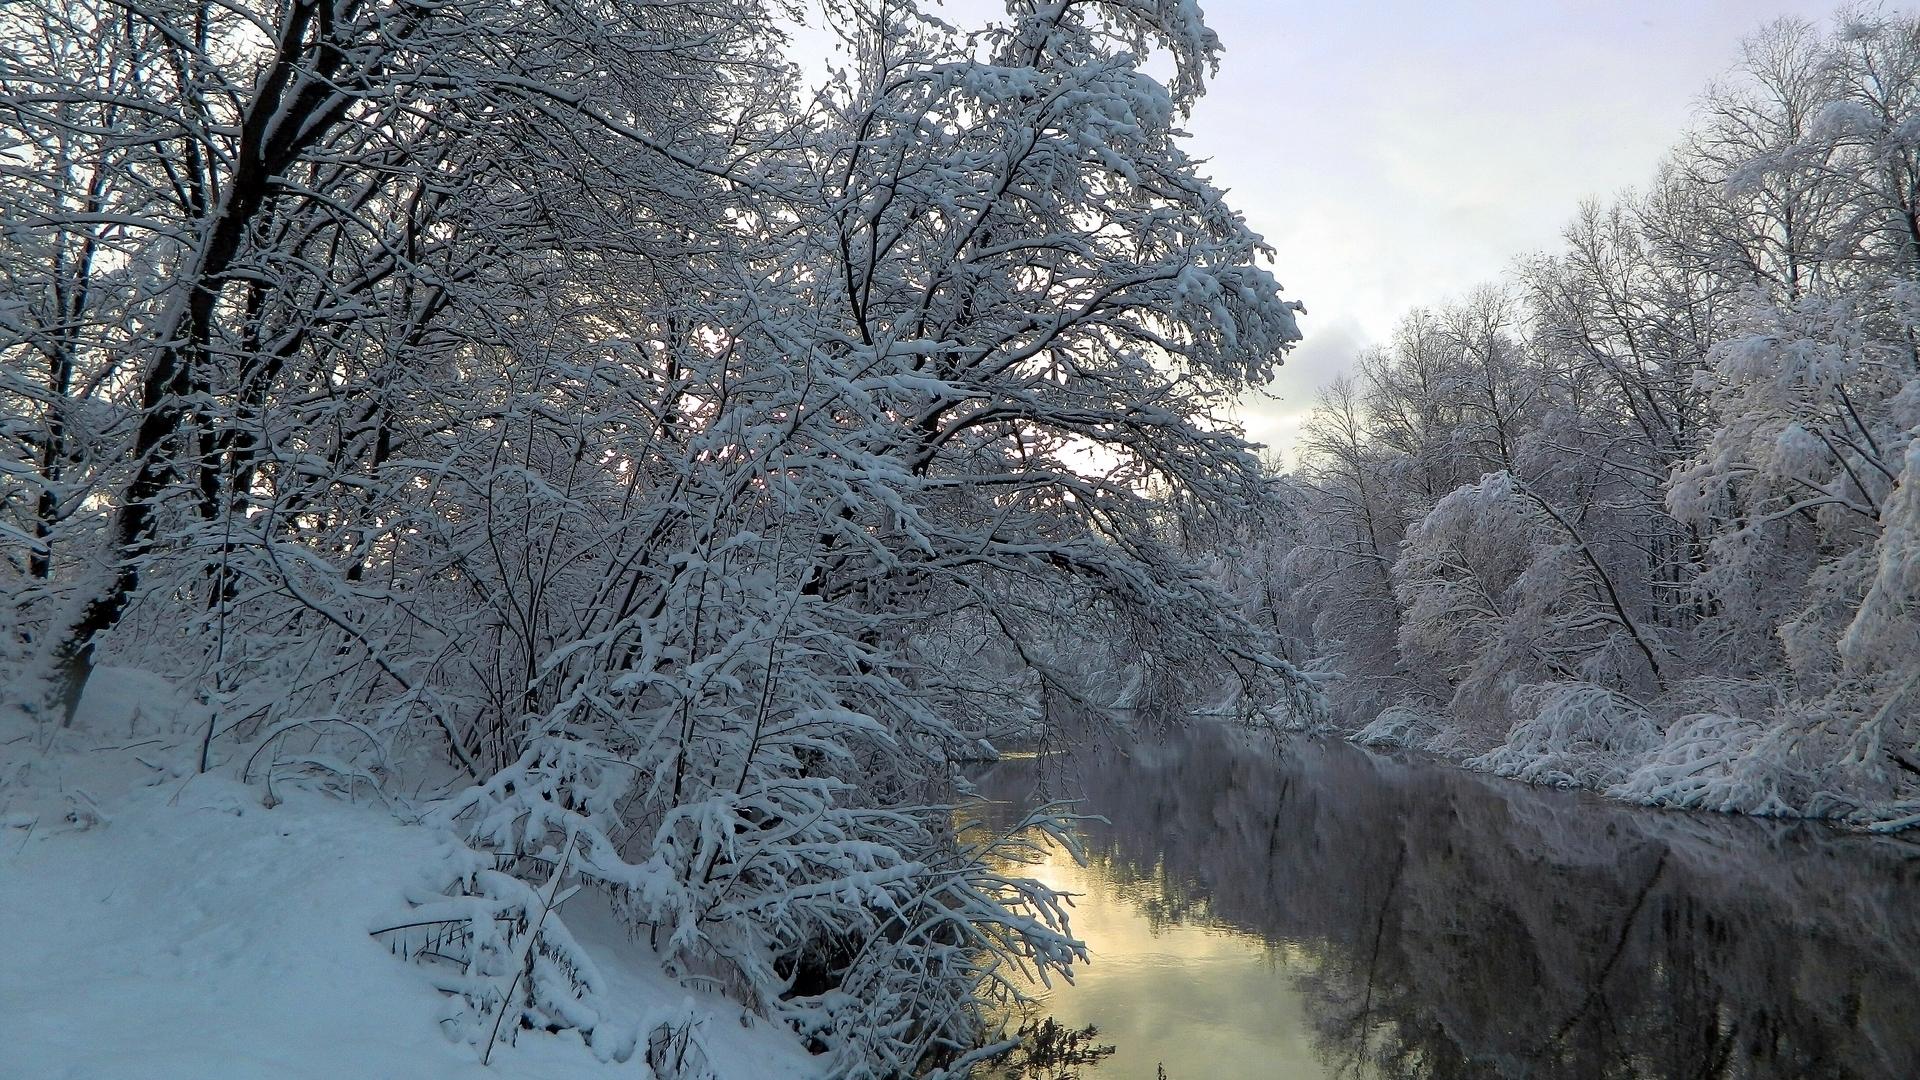 towards the snowy - photo #4